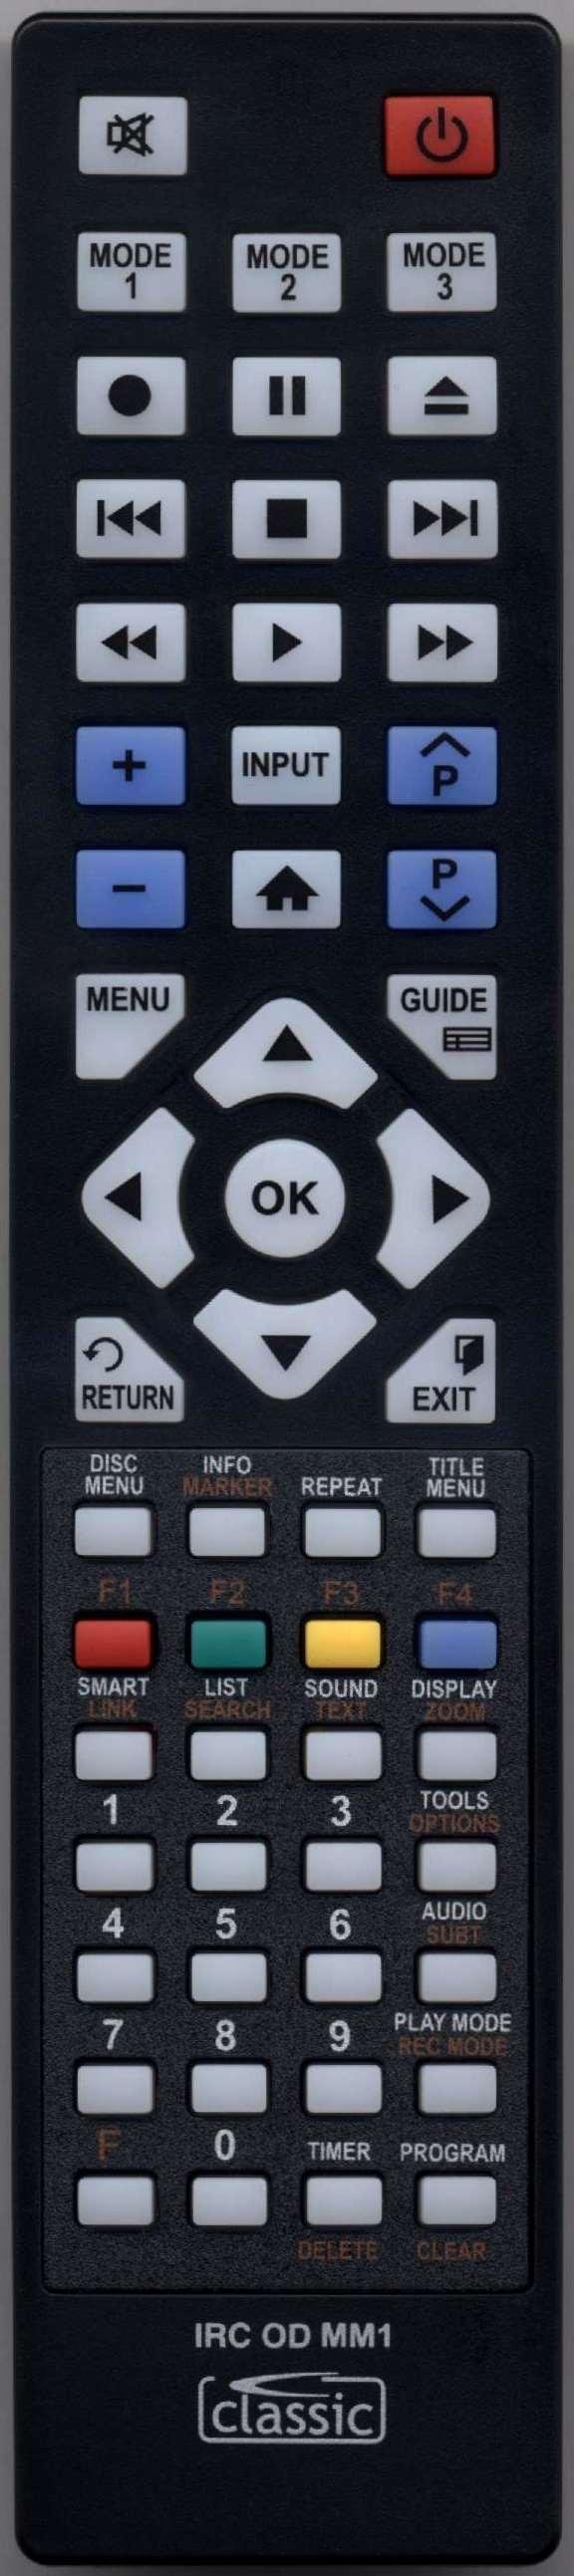 Samsung AK59-00104J Remote Control Alternative